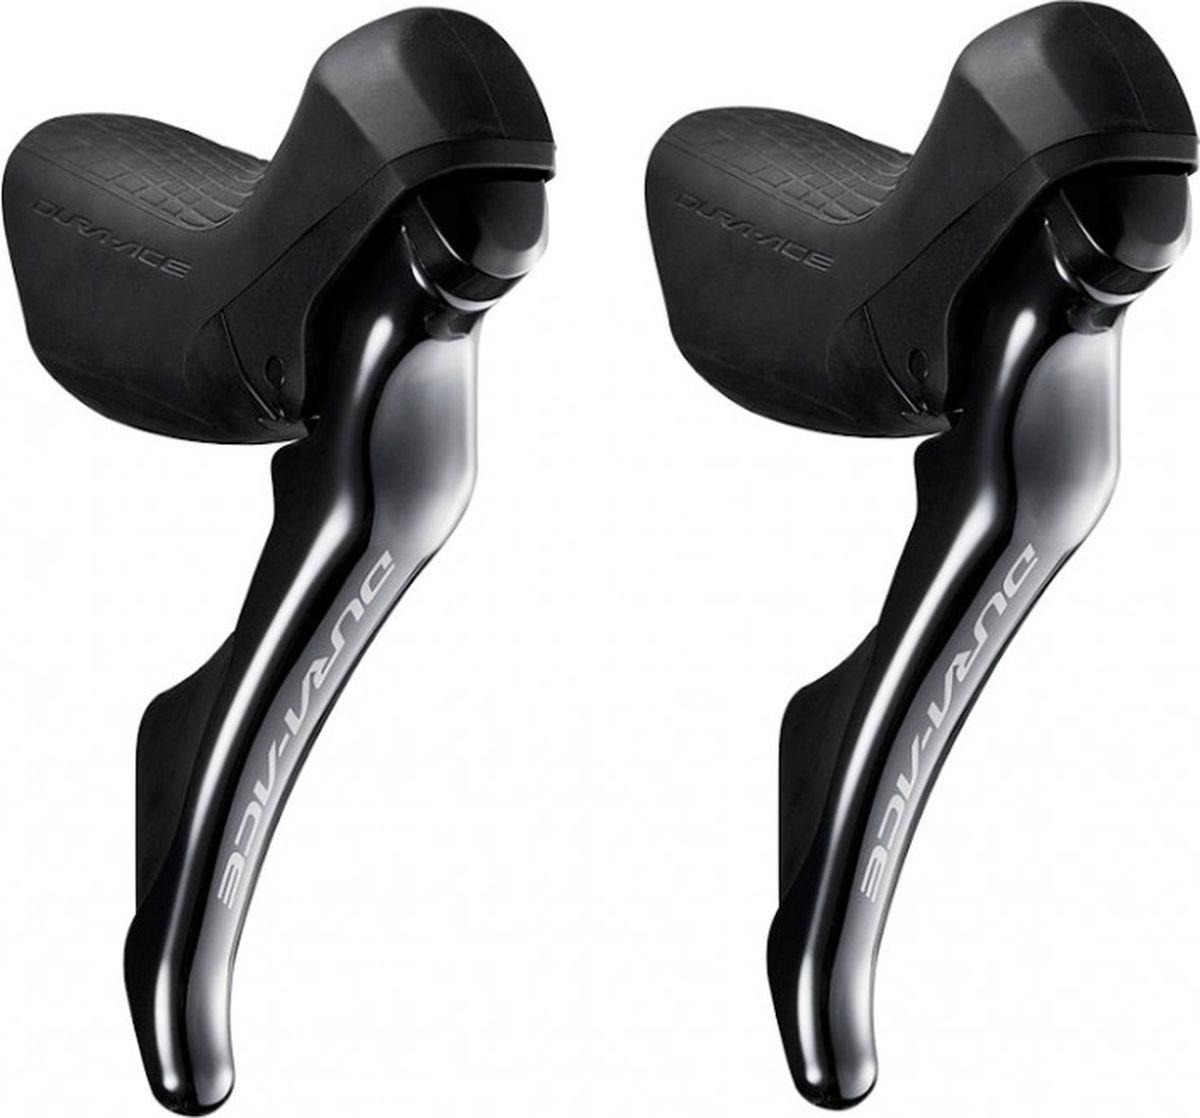 Шифтер/Тормоз Shimano Dura-Ace R9100, 2 x 11 скоростей запчасть shimano dura ace r9100 icsr910011225